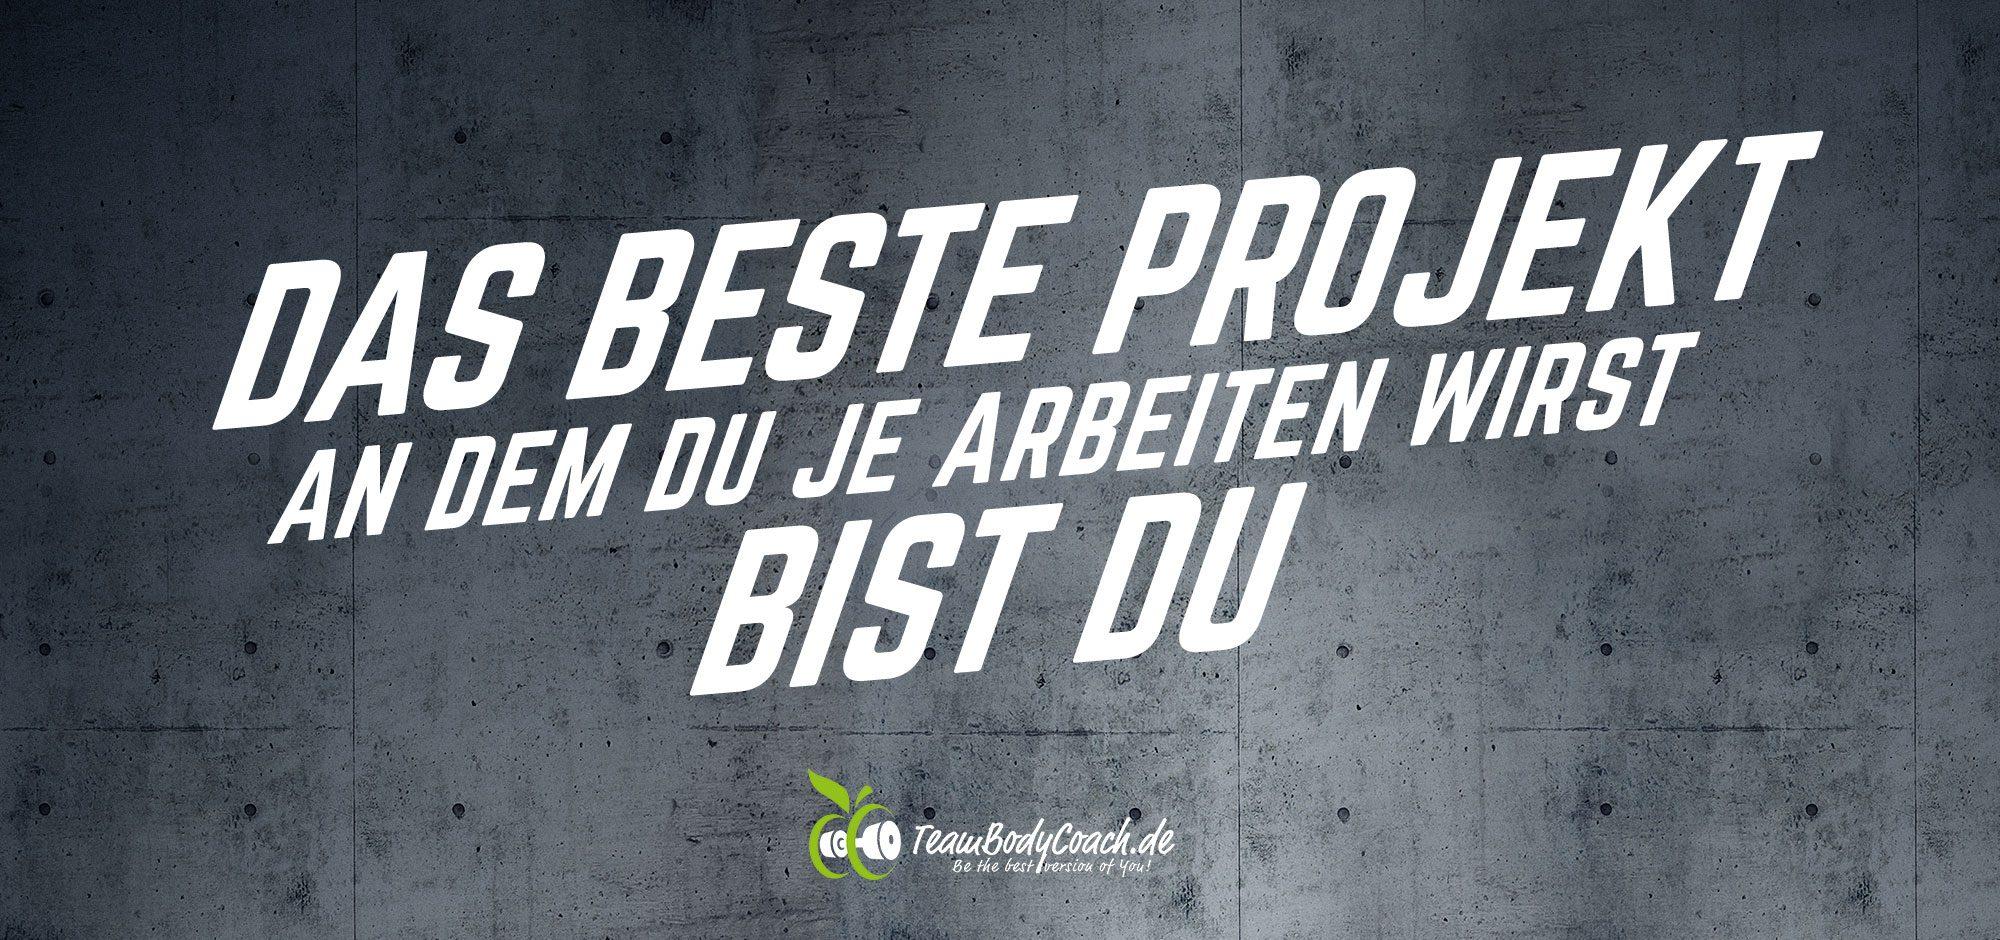 Personal Fitness Trainer Hamburg - TeamBodyCoach - Kostenloses Probetraining 2